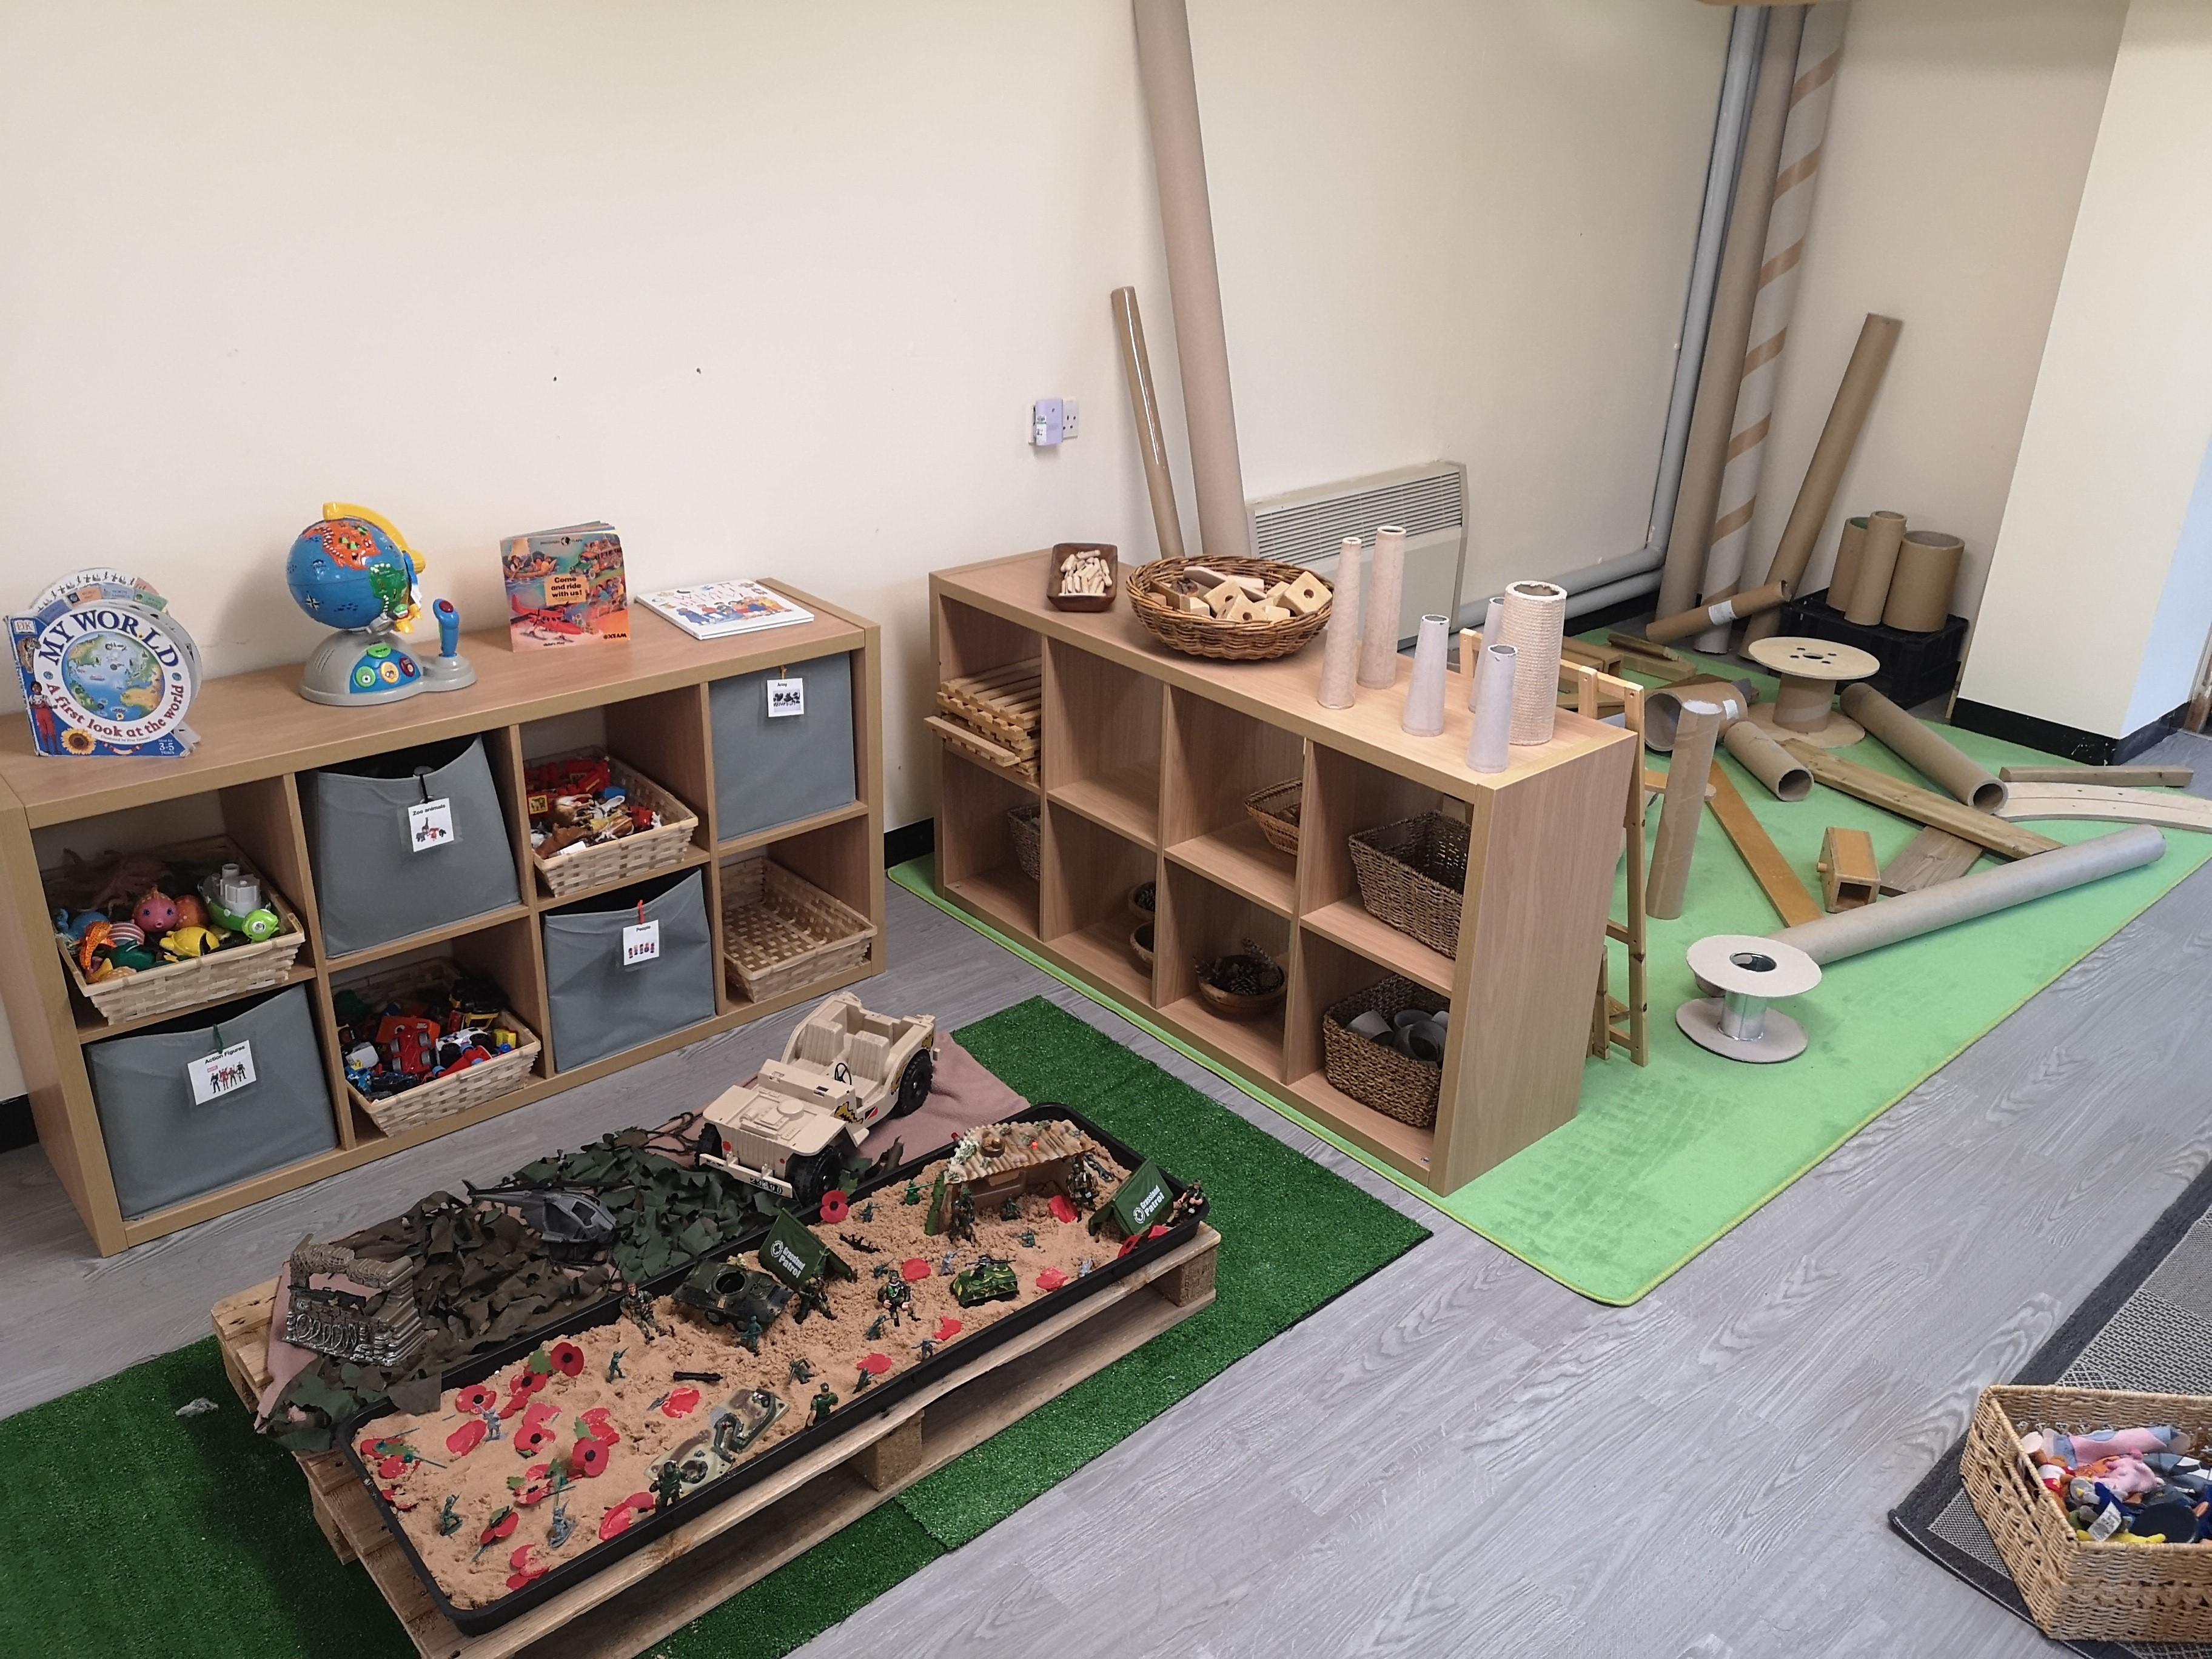 Small World Construction